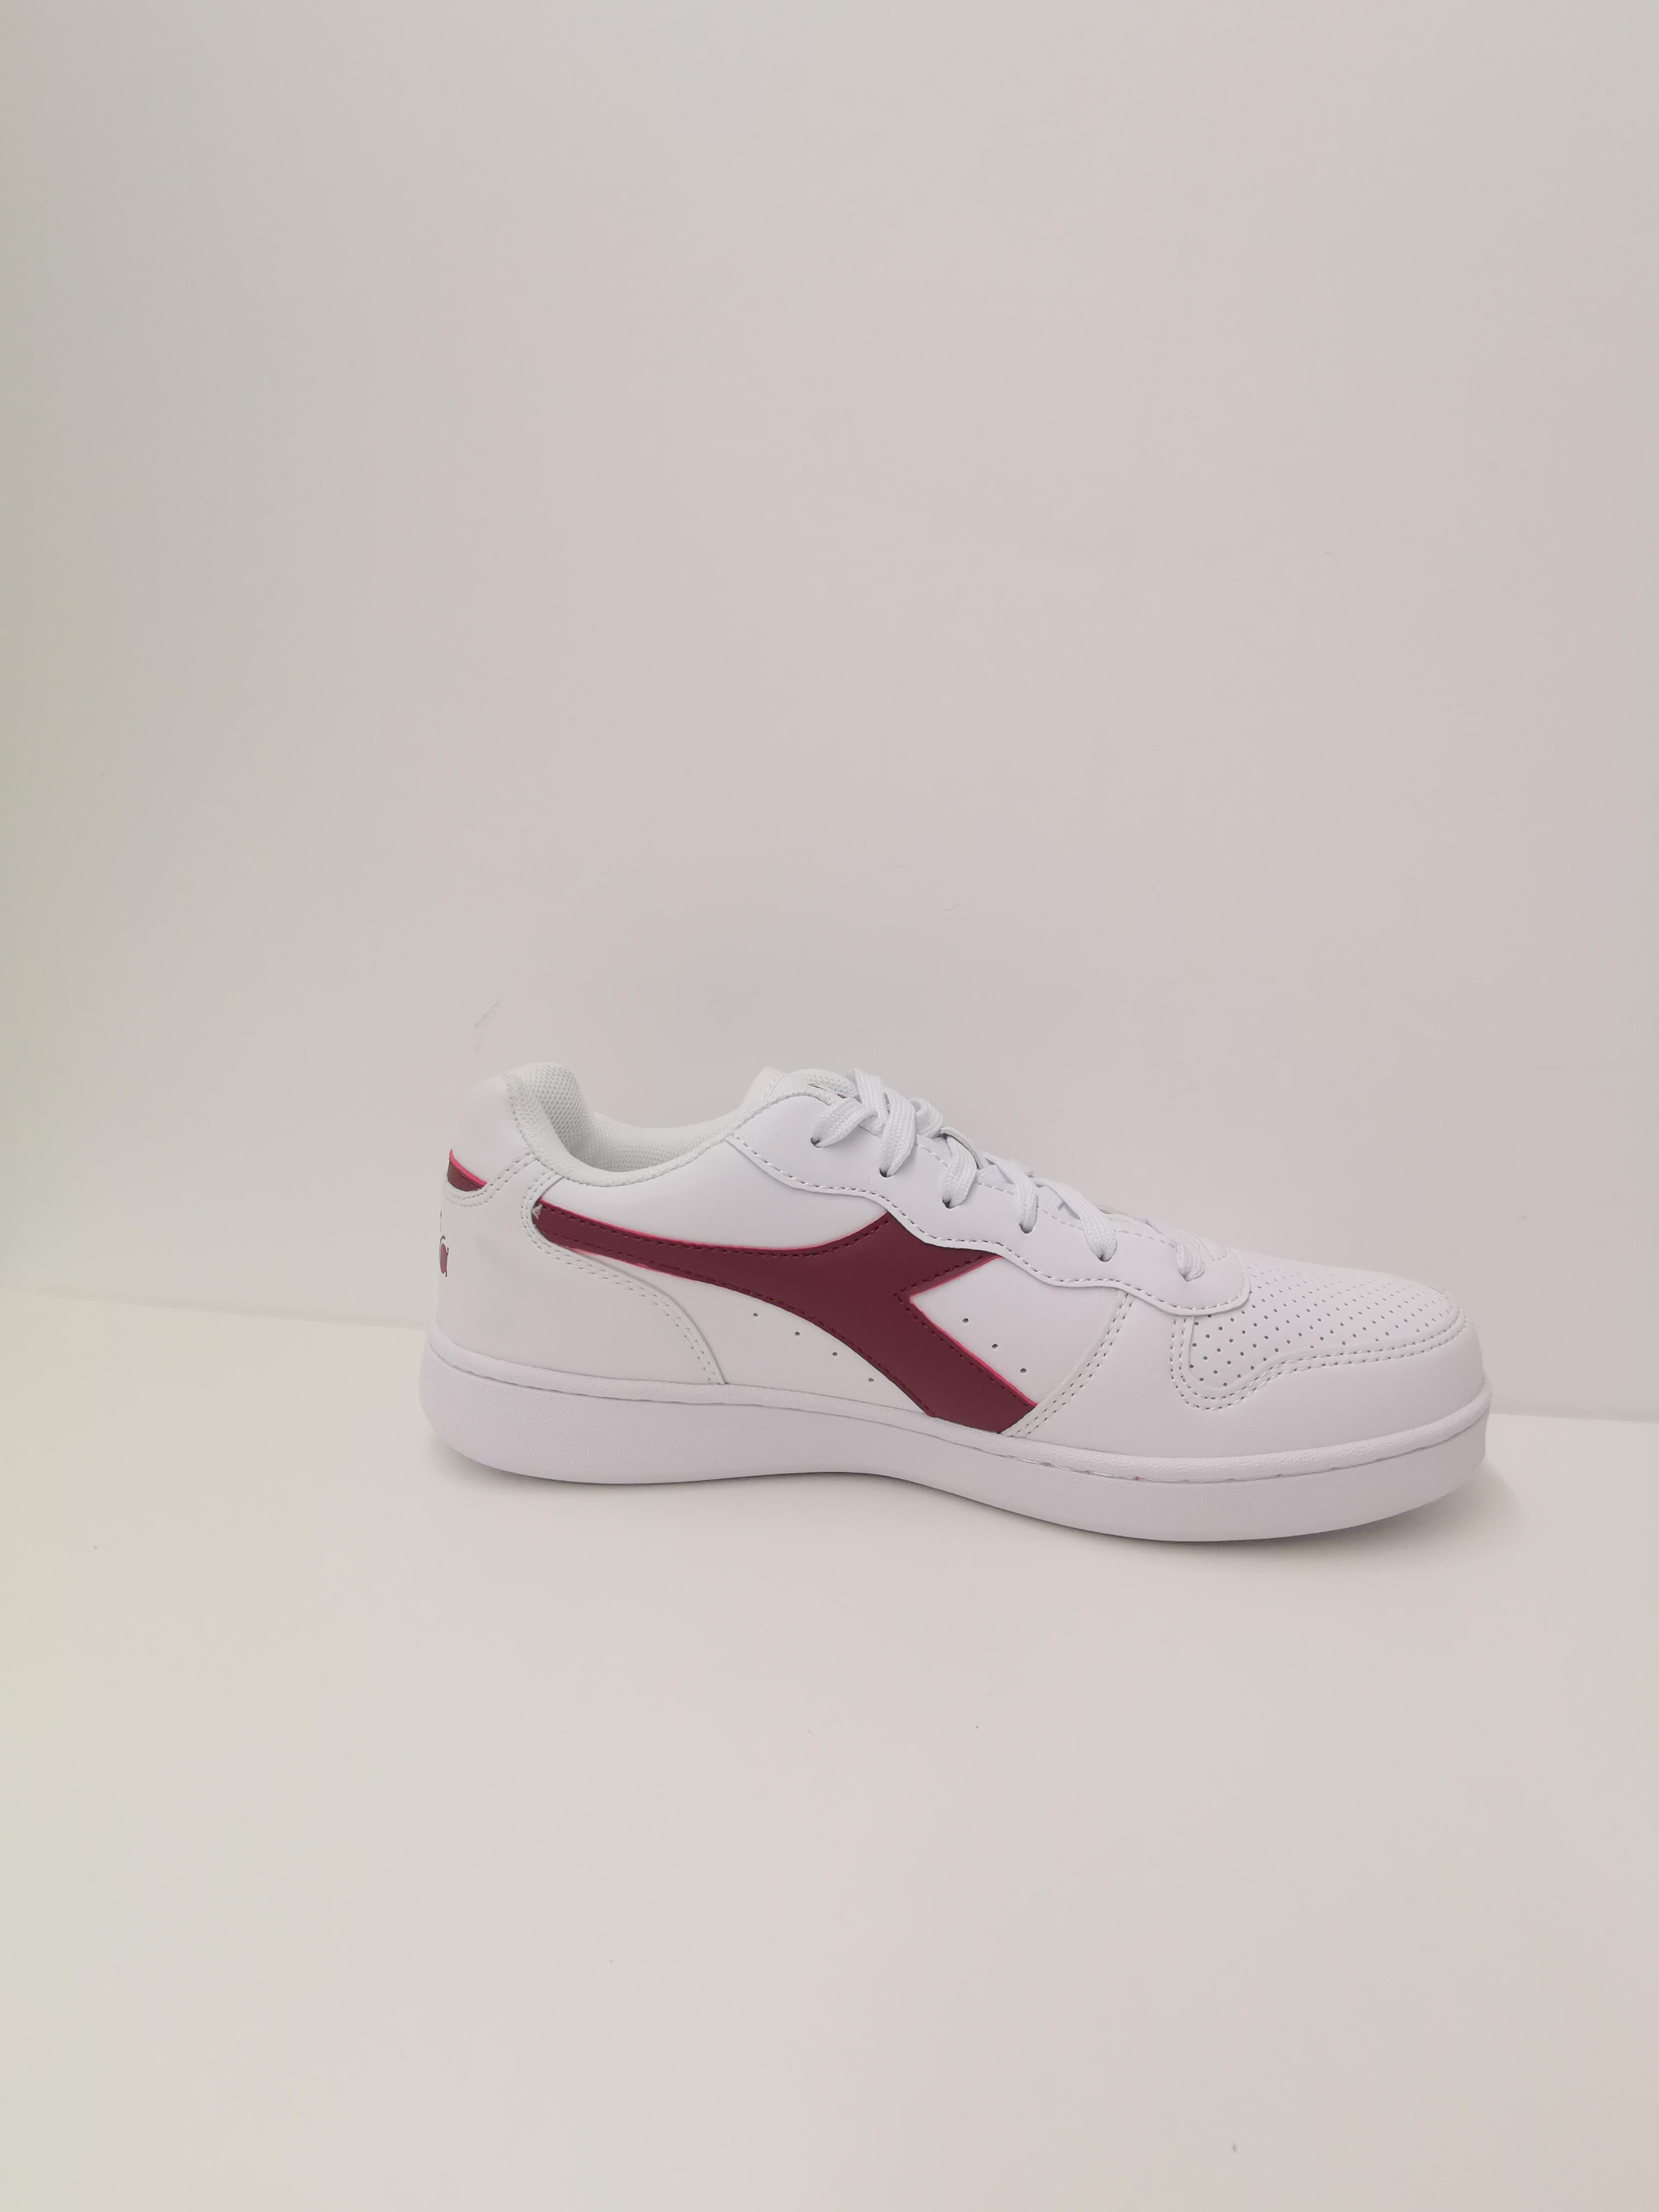 Sneaker playground DIADORA | Scarpe | 101.172319C4031 BIANCO/VIOLA PRUGNA